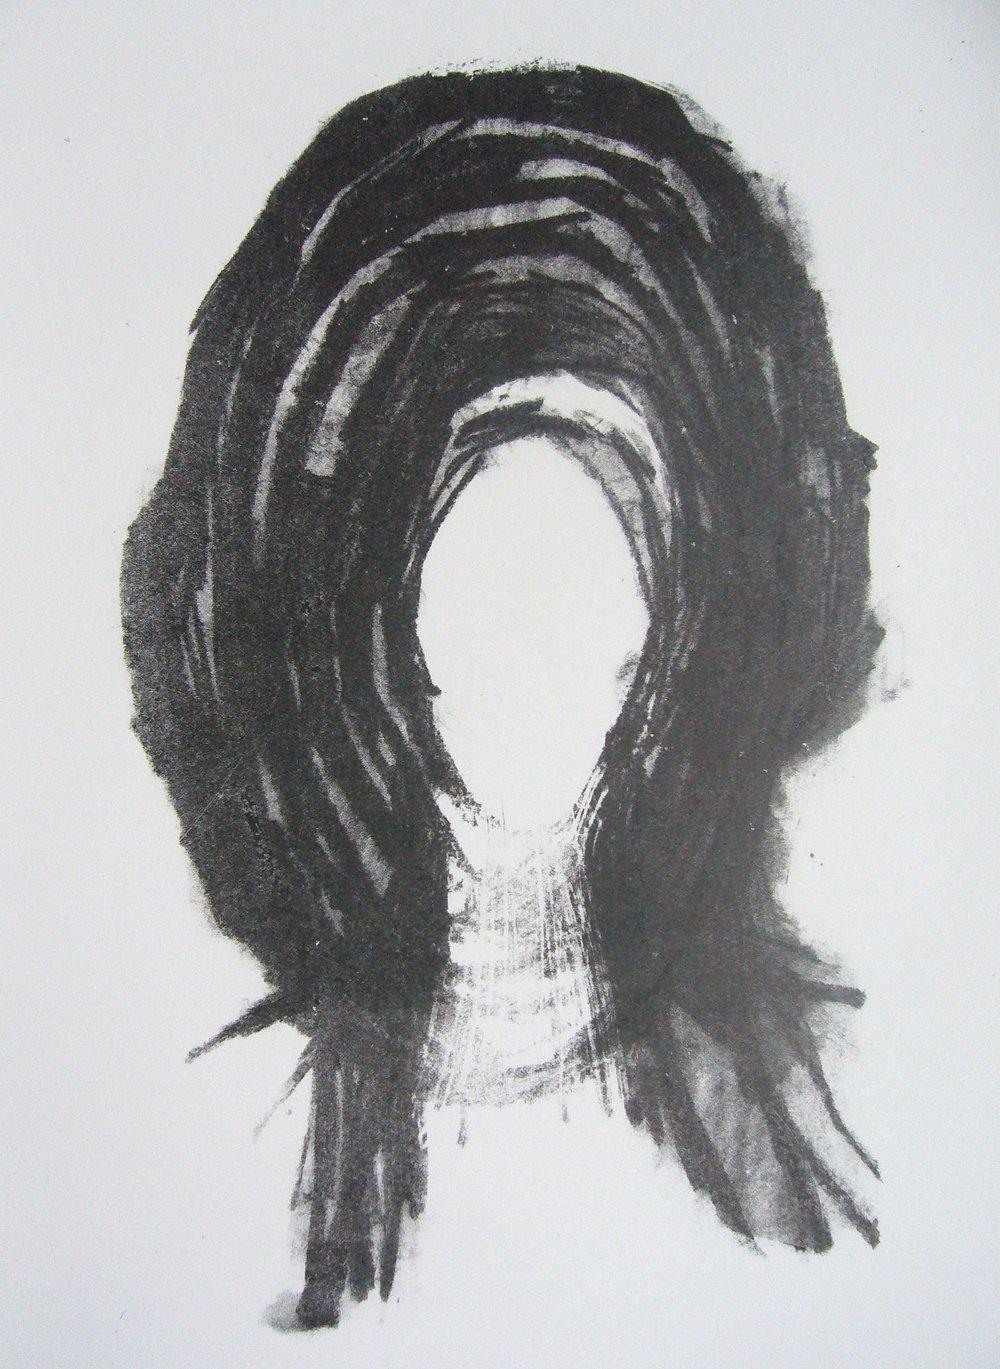 Kopf XV, e.e., 2014, 59 cm x 42 cm.JPG